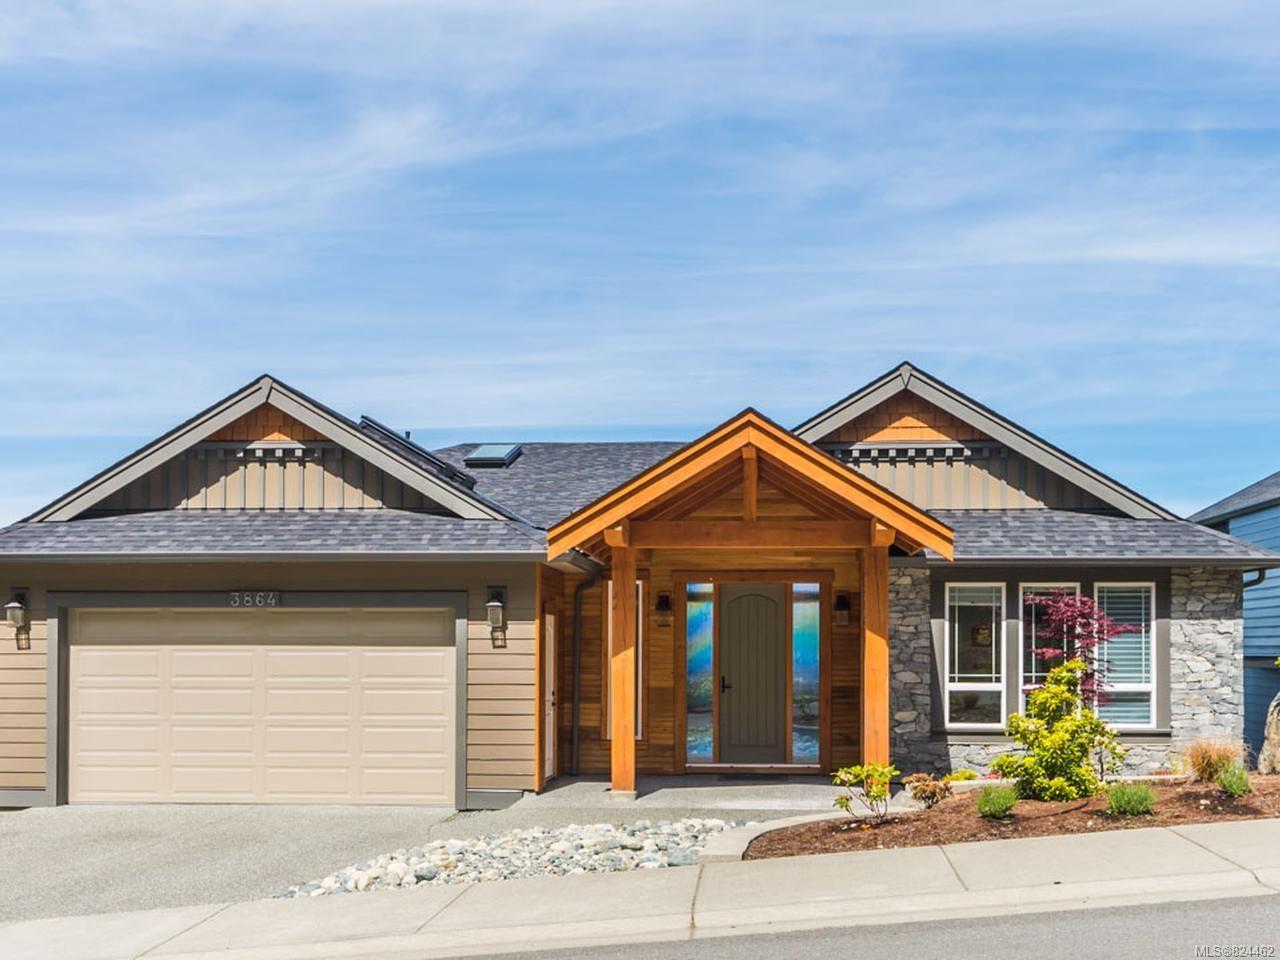 Photo 2: Photos: 3864 Gulfview Dr in NANAIMO: Na North Nanaimo House for sale (Nanaimo)  : MLS®# 824462